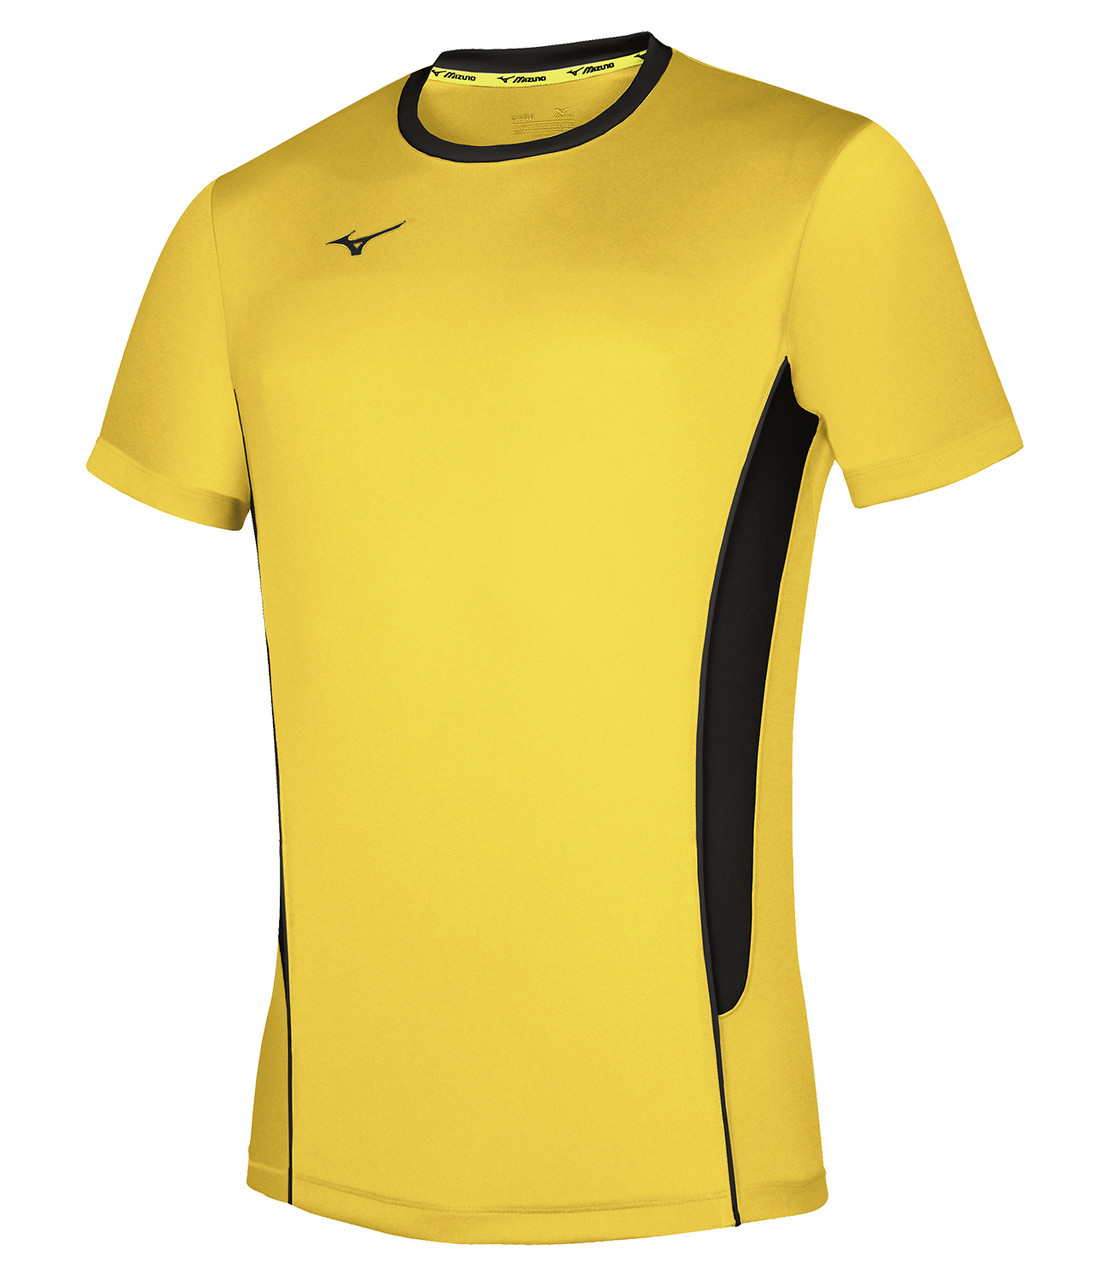 Волейбольная футболка Mizuno Authentic High-Kyu Tee (V2EA7001-45)